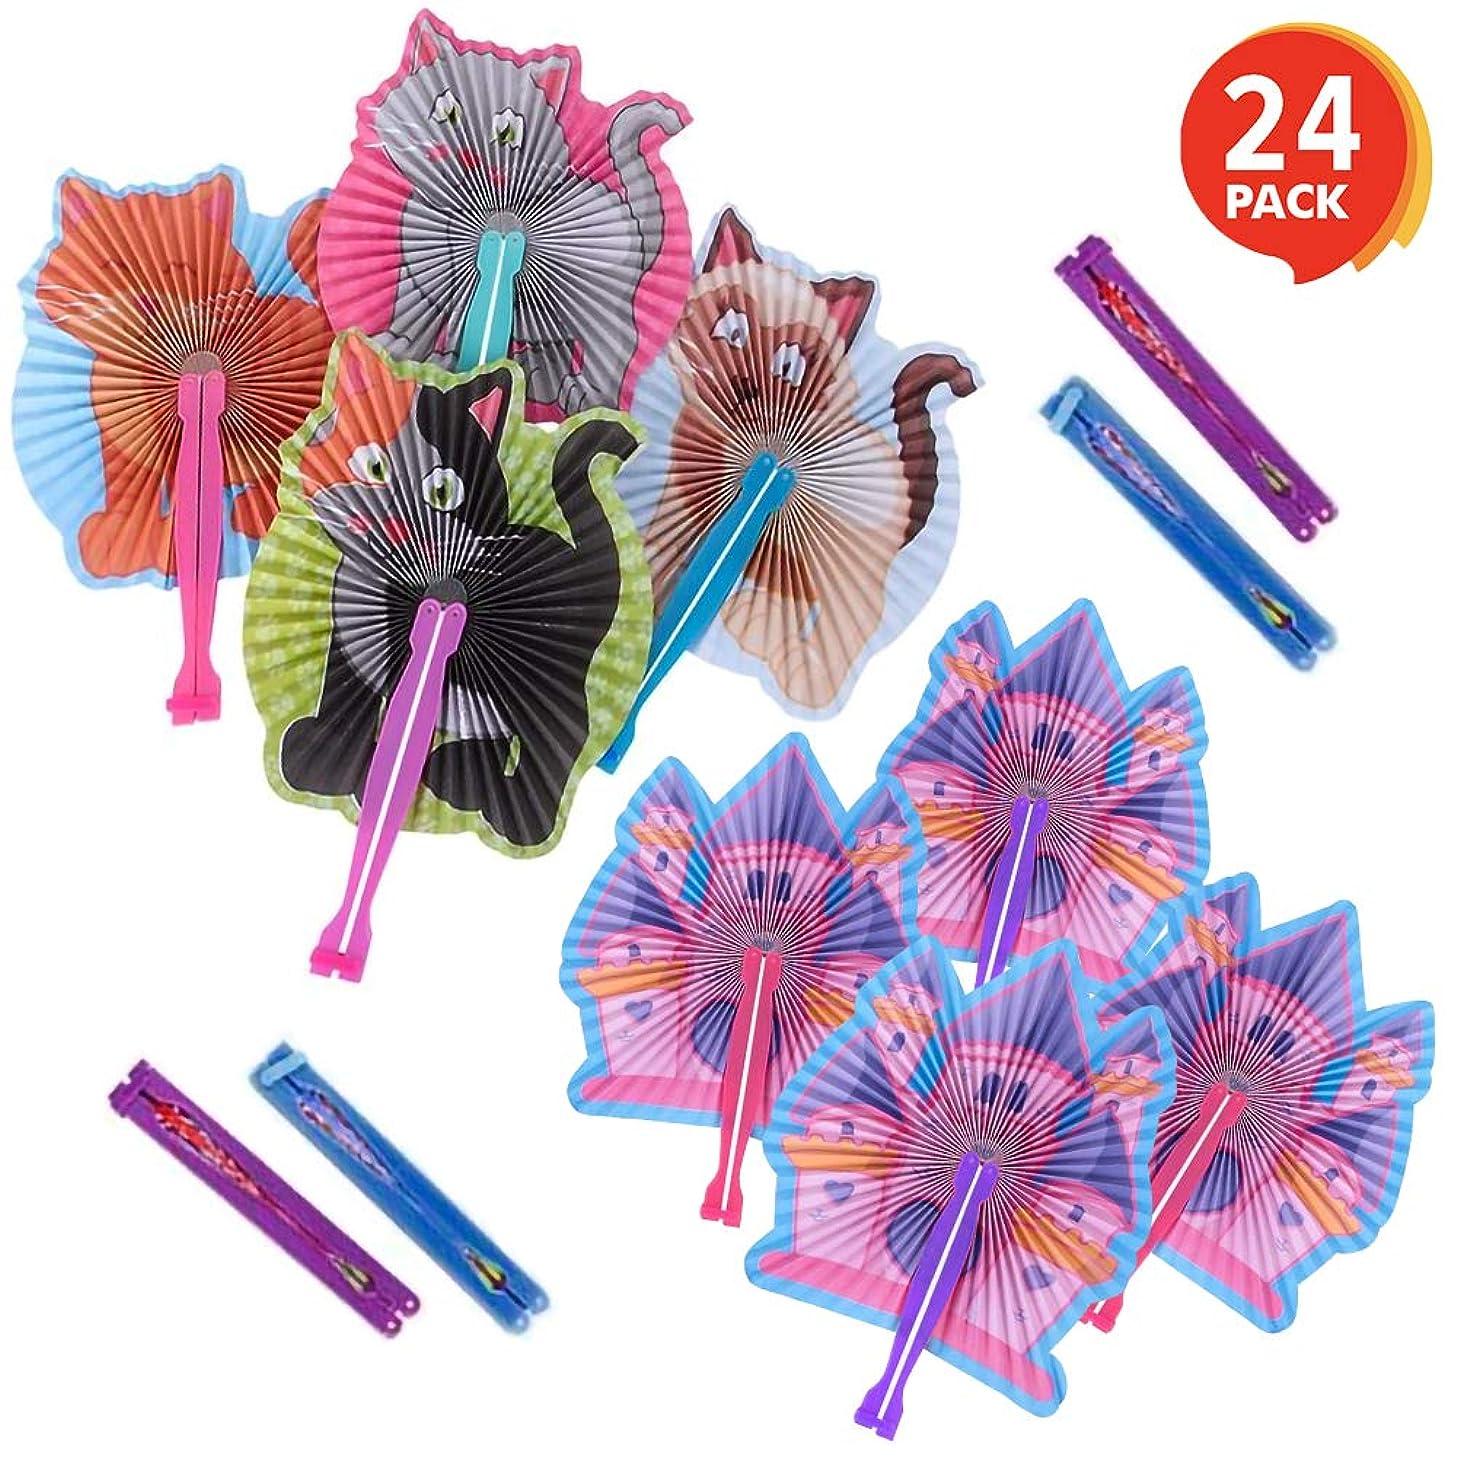 "ArtCreativity 10"" Handheld Folding Fans for Kids (Set of 24) | Includes 12 Kitten & 12 Princess Castle Folding Fans | Colorful Foldable Paper Fan Kit | Fun Birthday Party Favors/Outdoor Summer Toys"